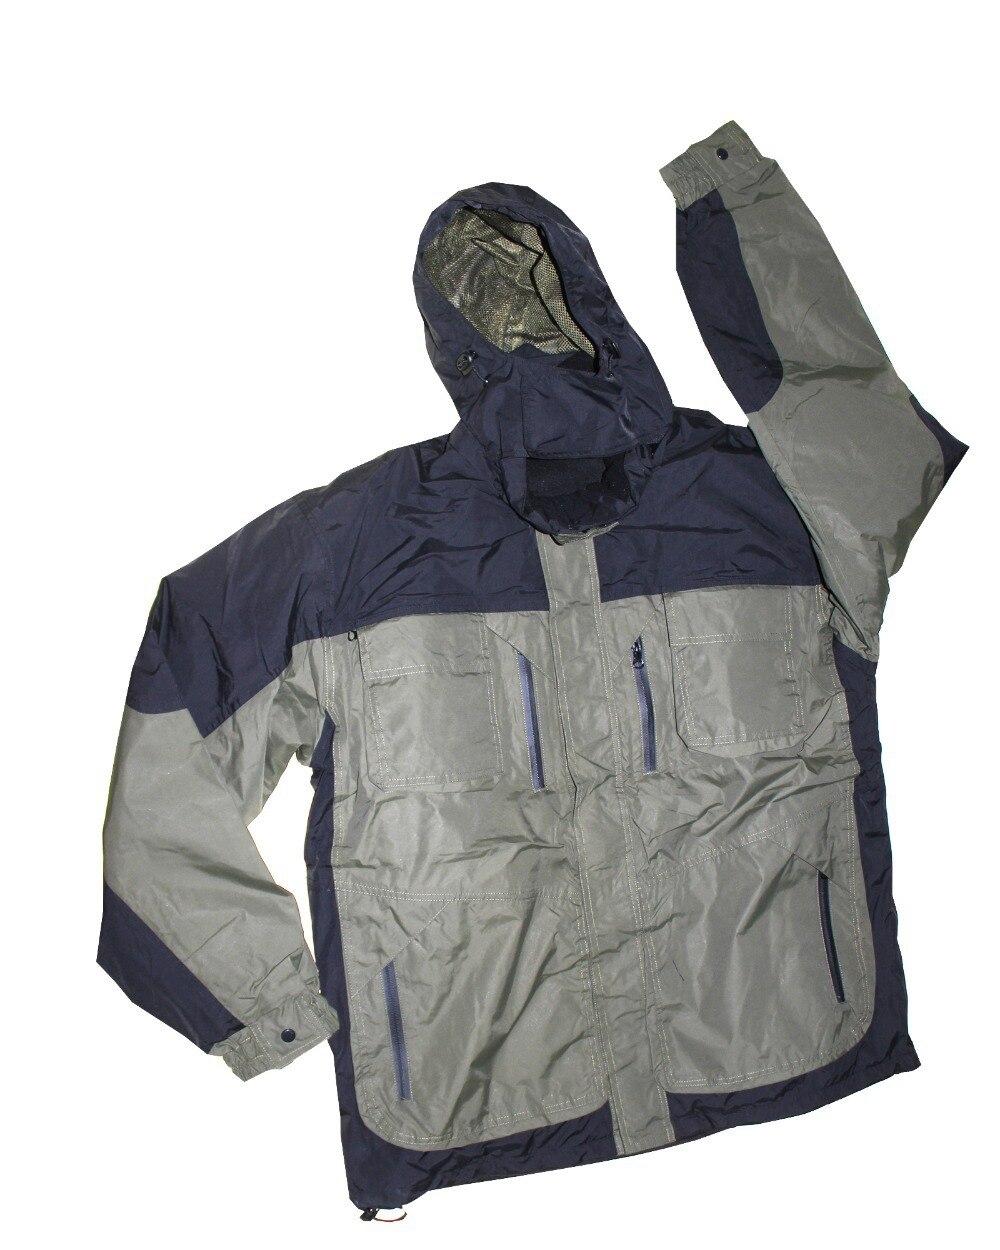 Carp Suit Warm Waterproof Jacket Fishing Tackle In Fishing